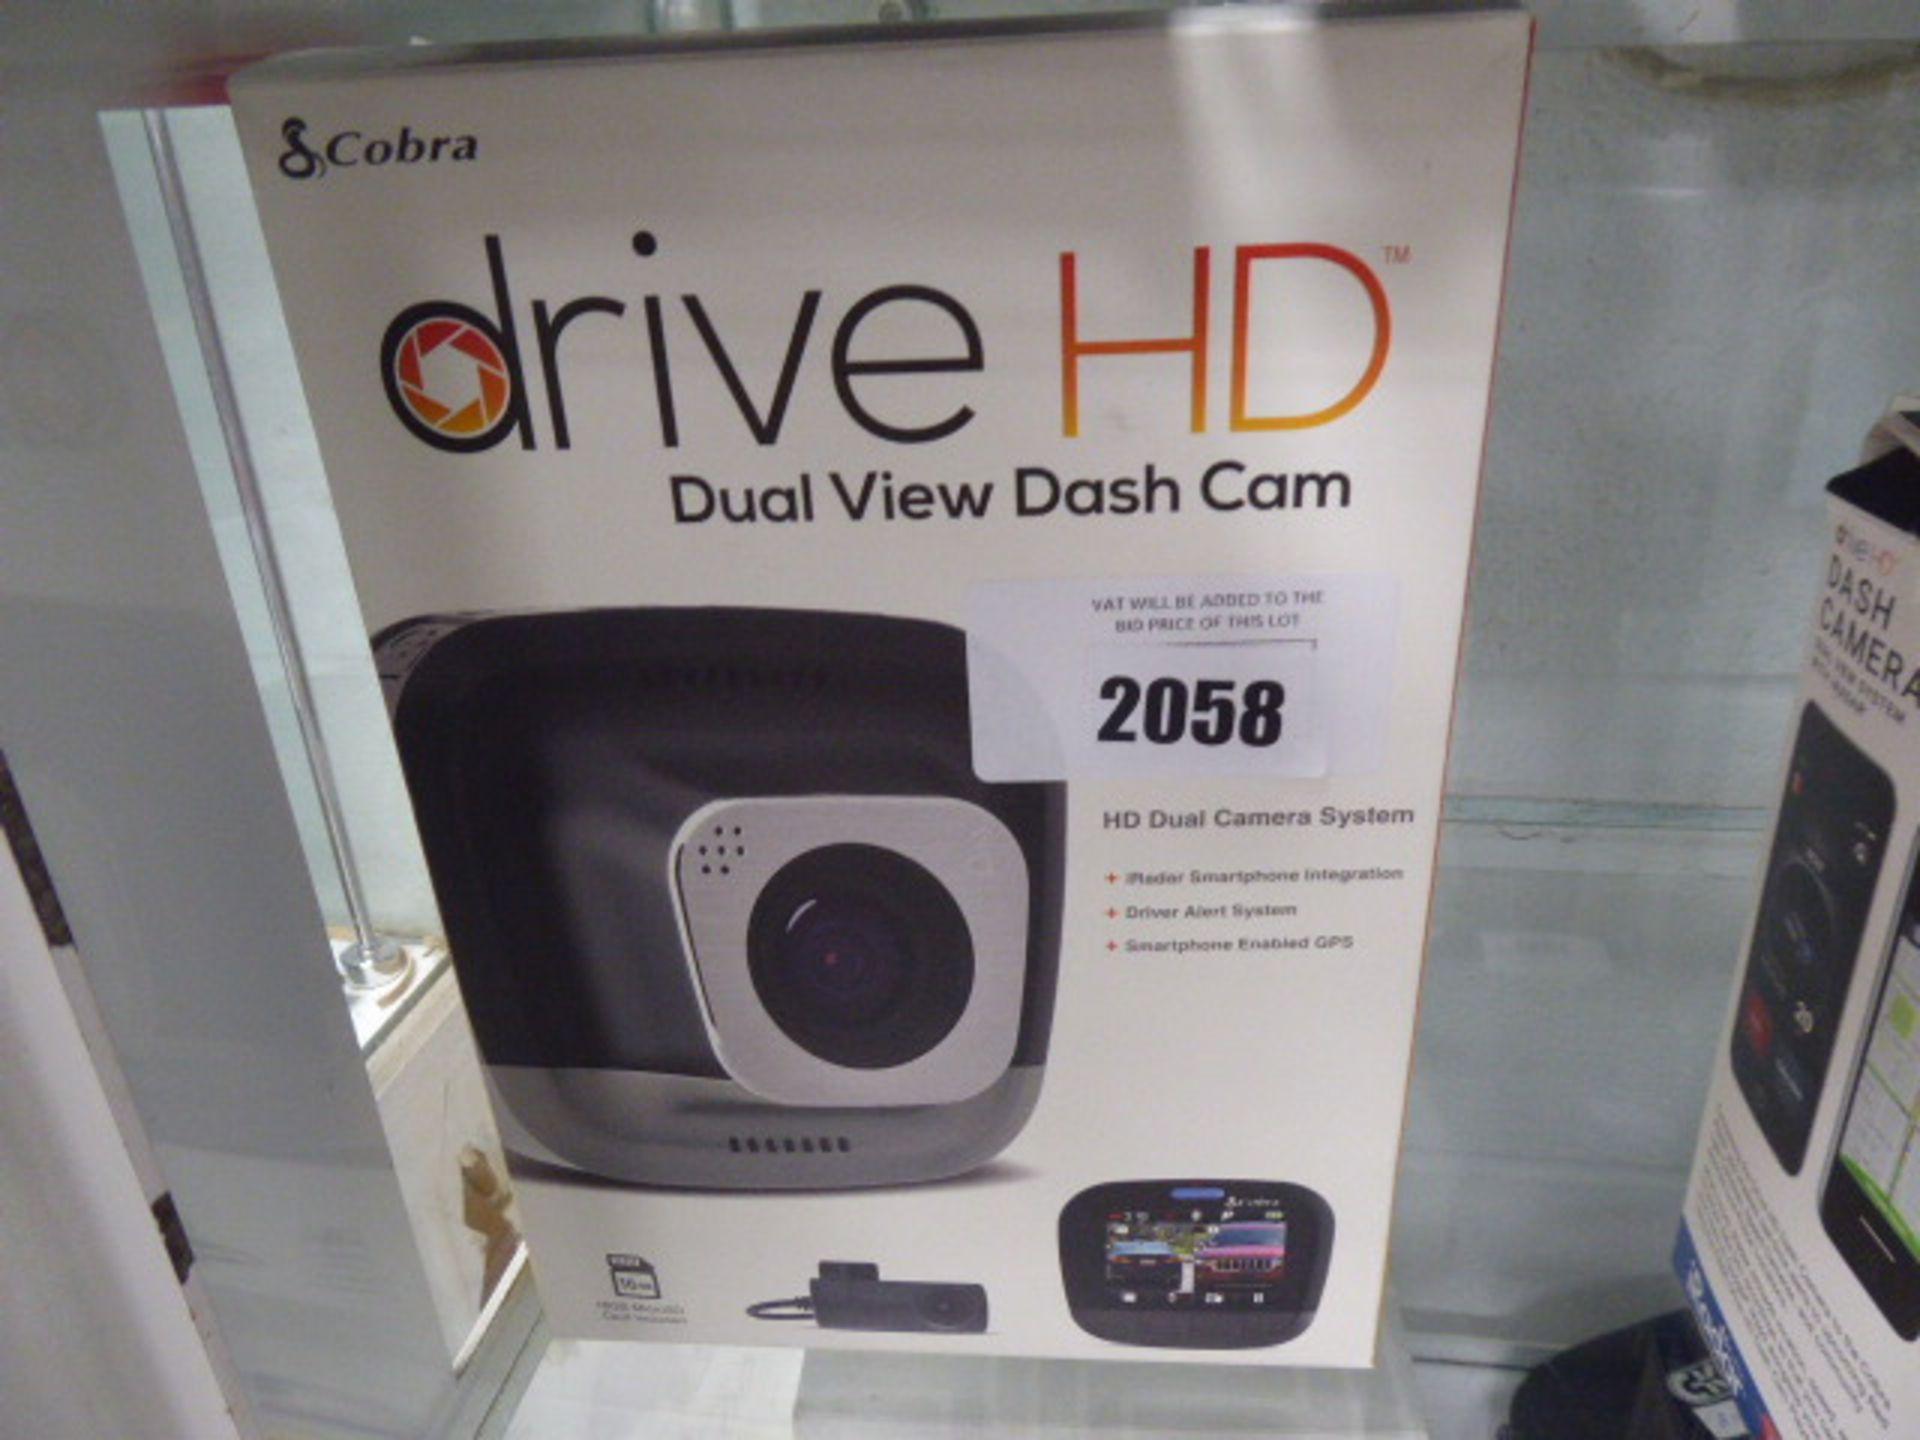 Lot 2058 - Drive HD dash cam system in box